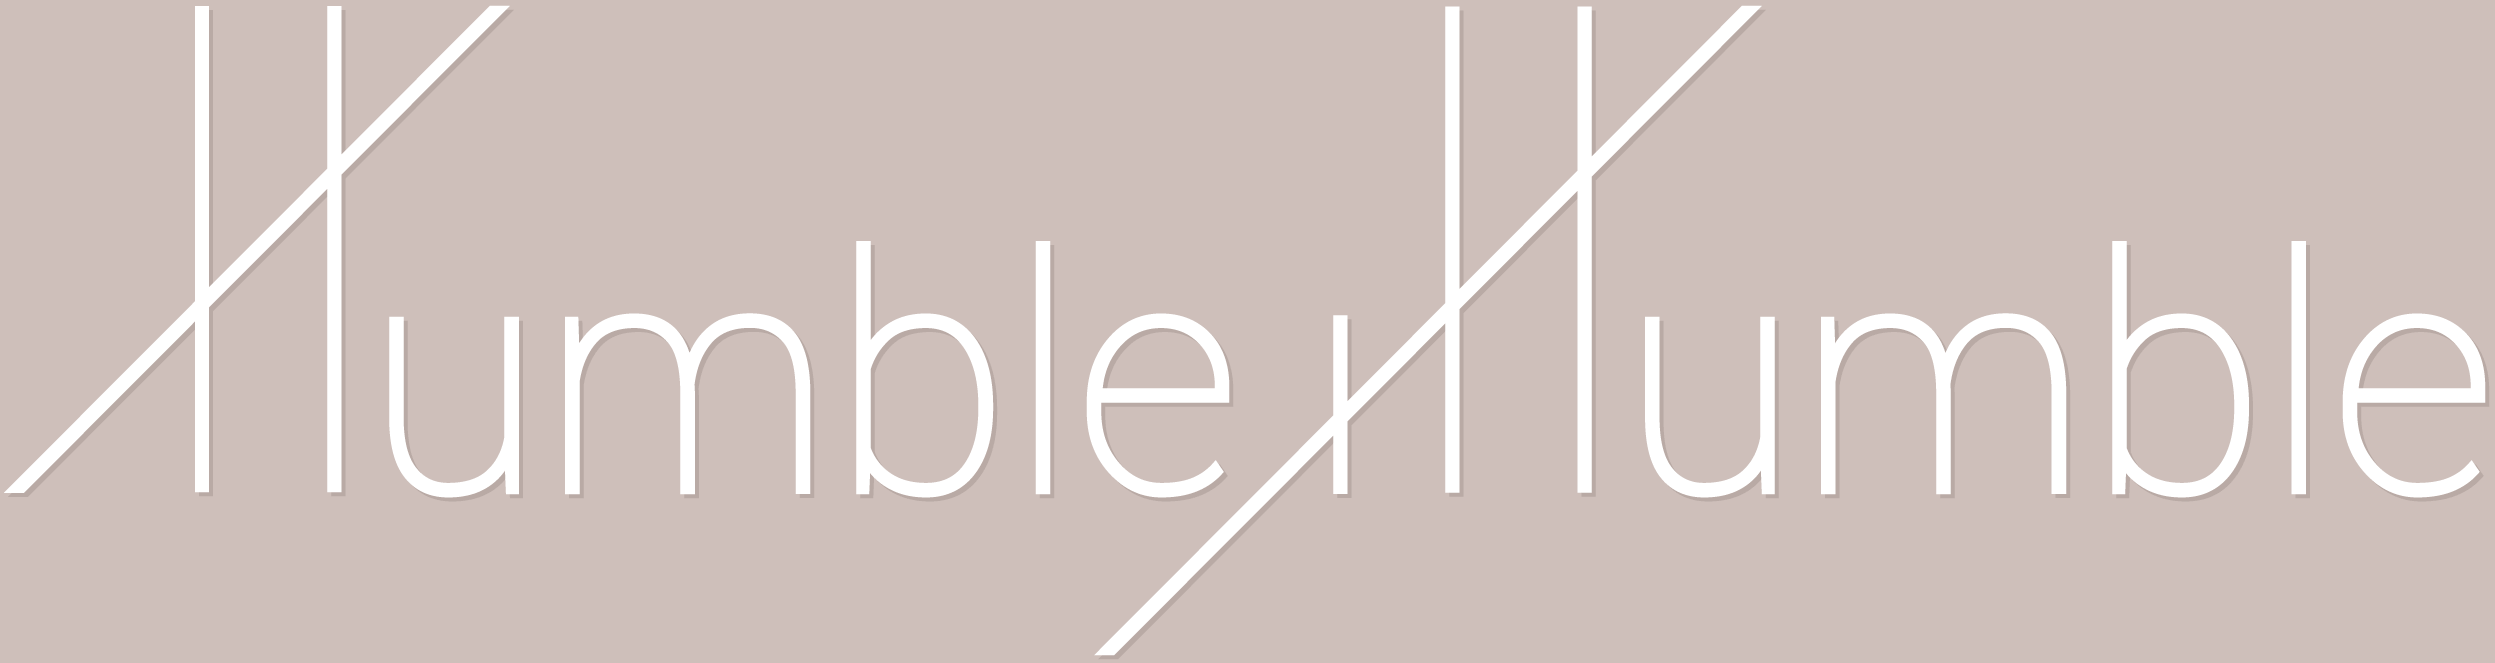 Humble&Humble logotype